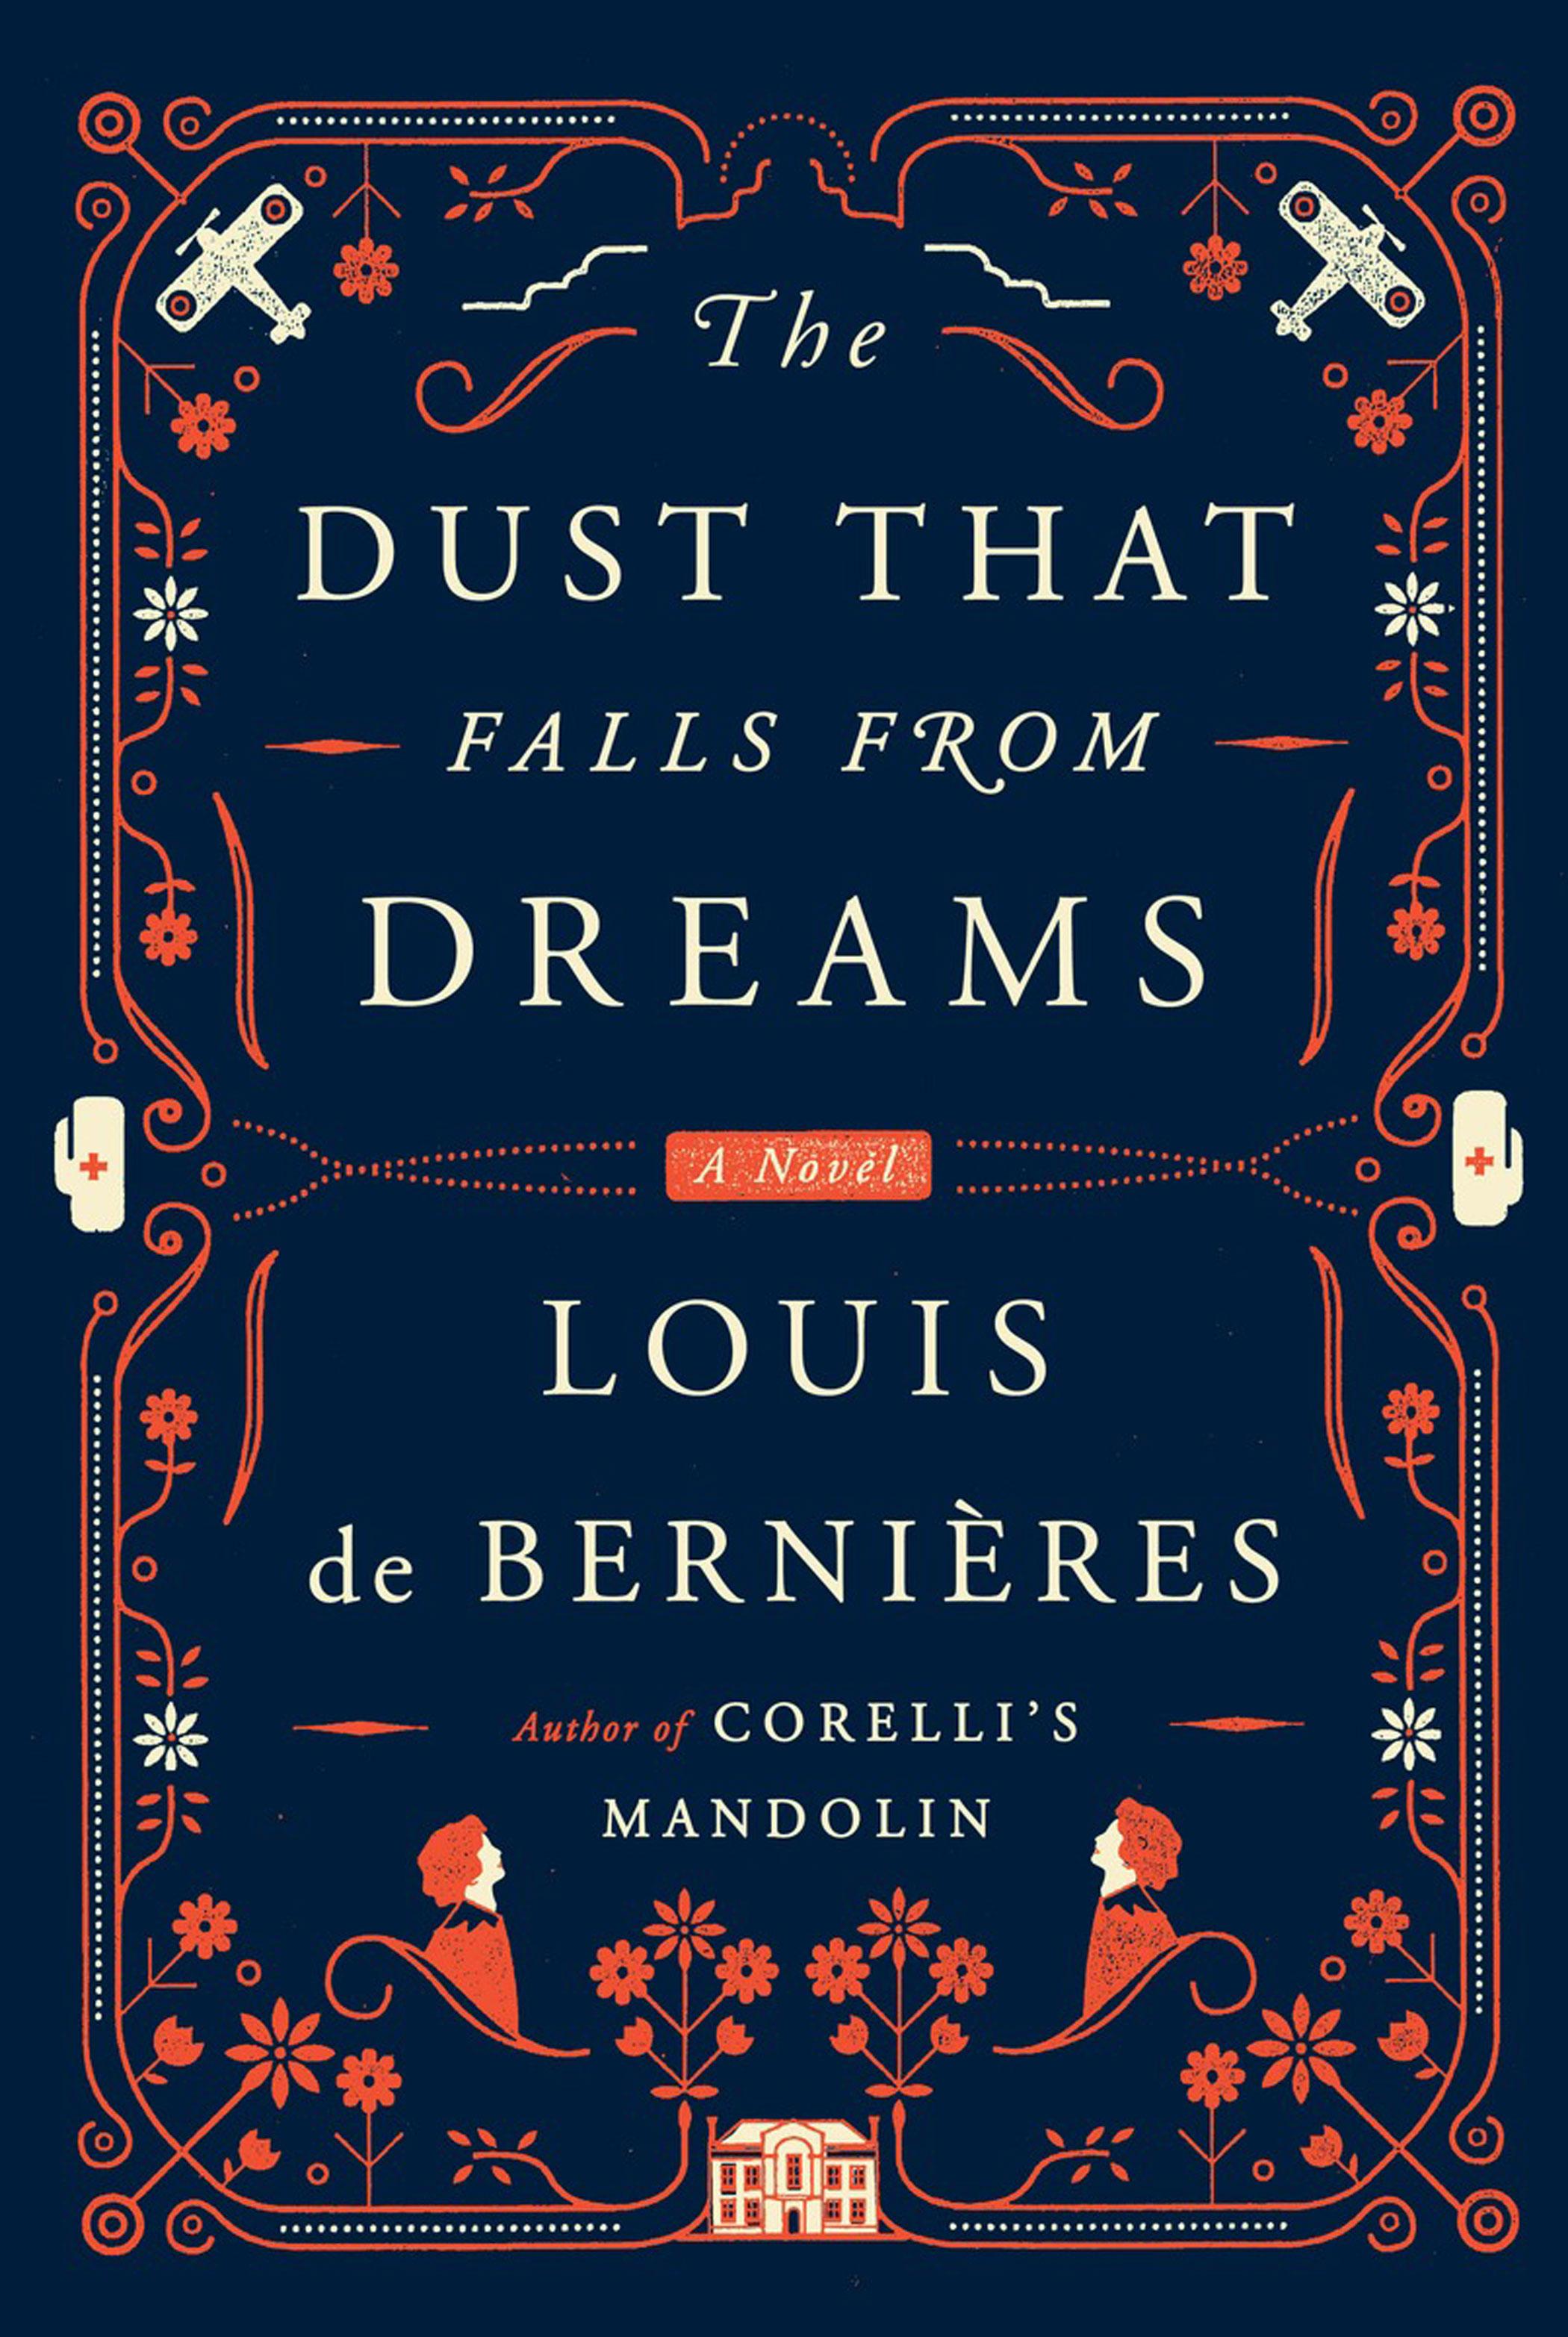 fiction stories, Language Skills Abroad